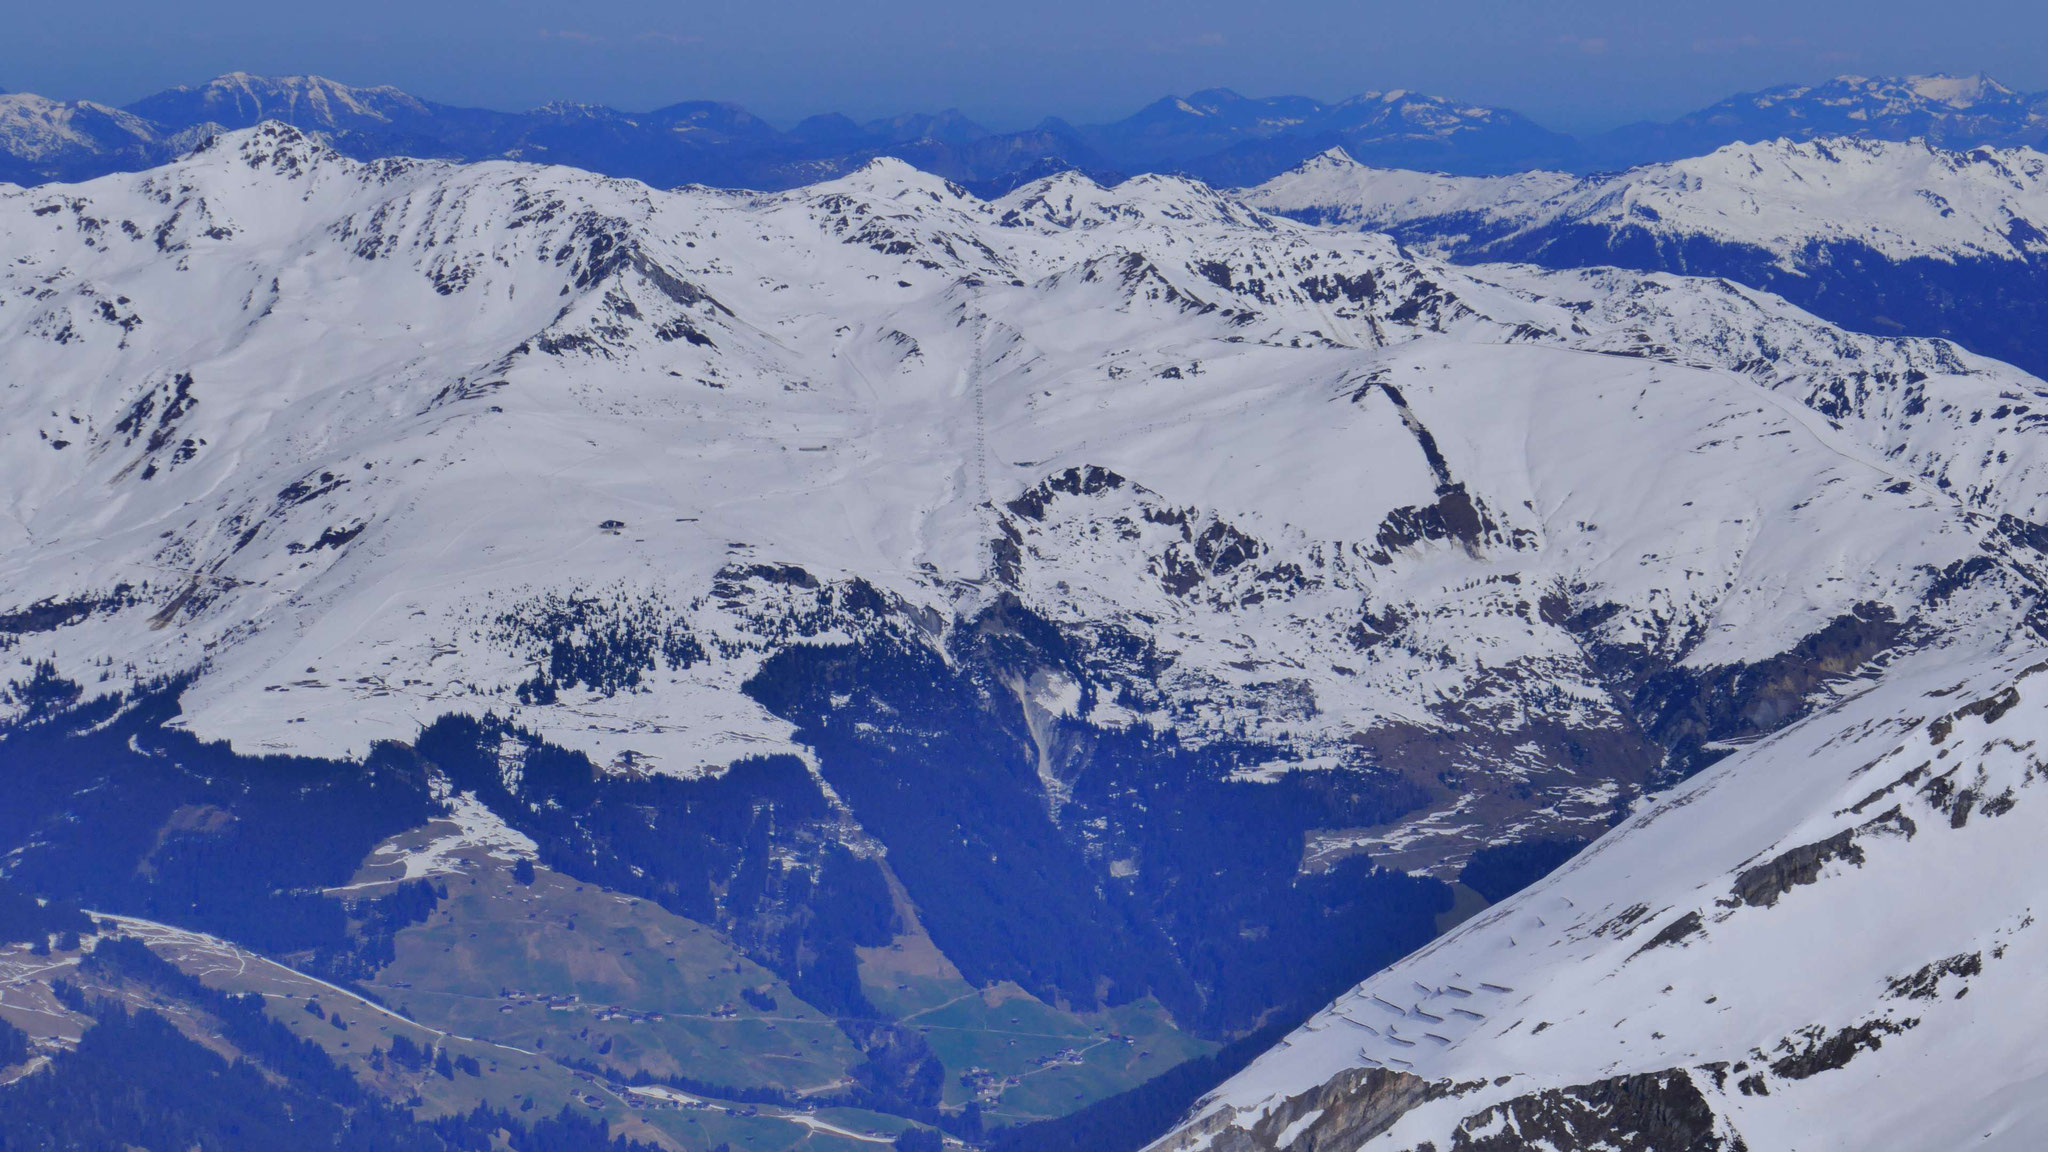 Links Rastkogel, rechts Skigebiet Mayrhofen-Penken